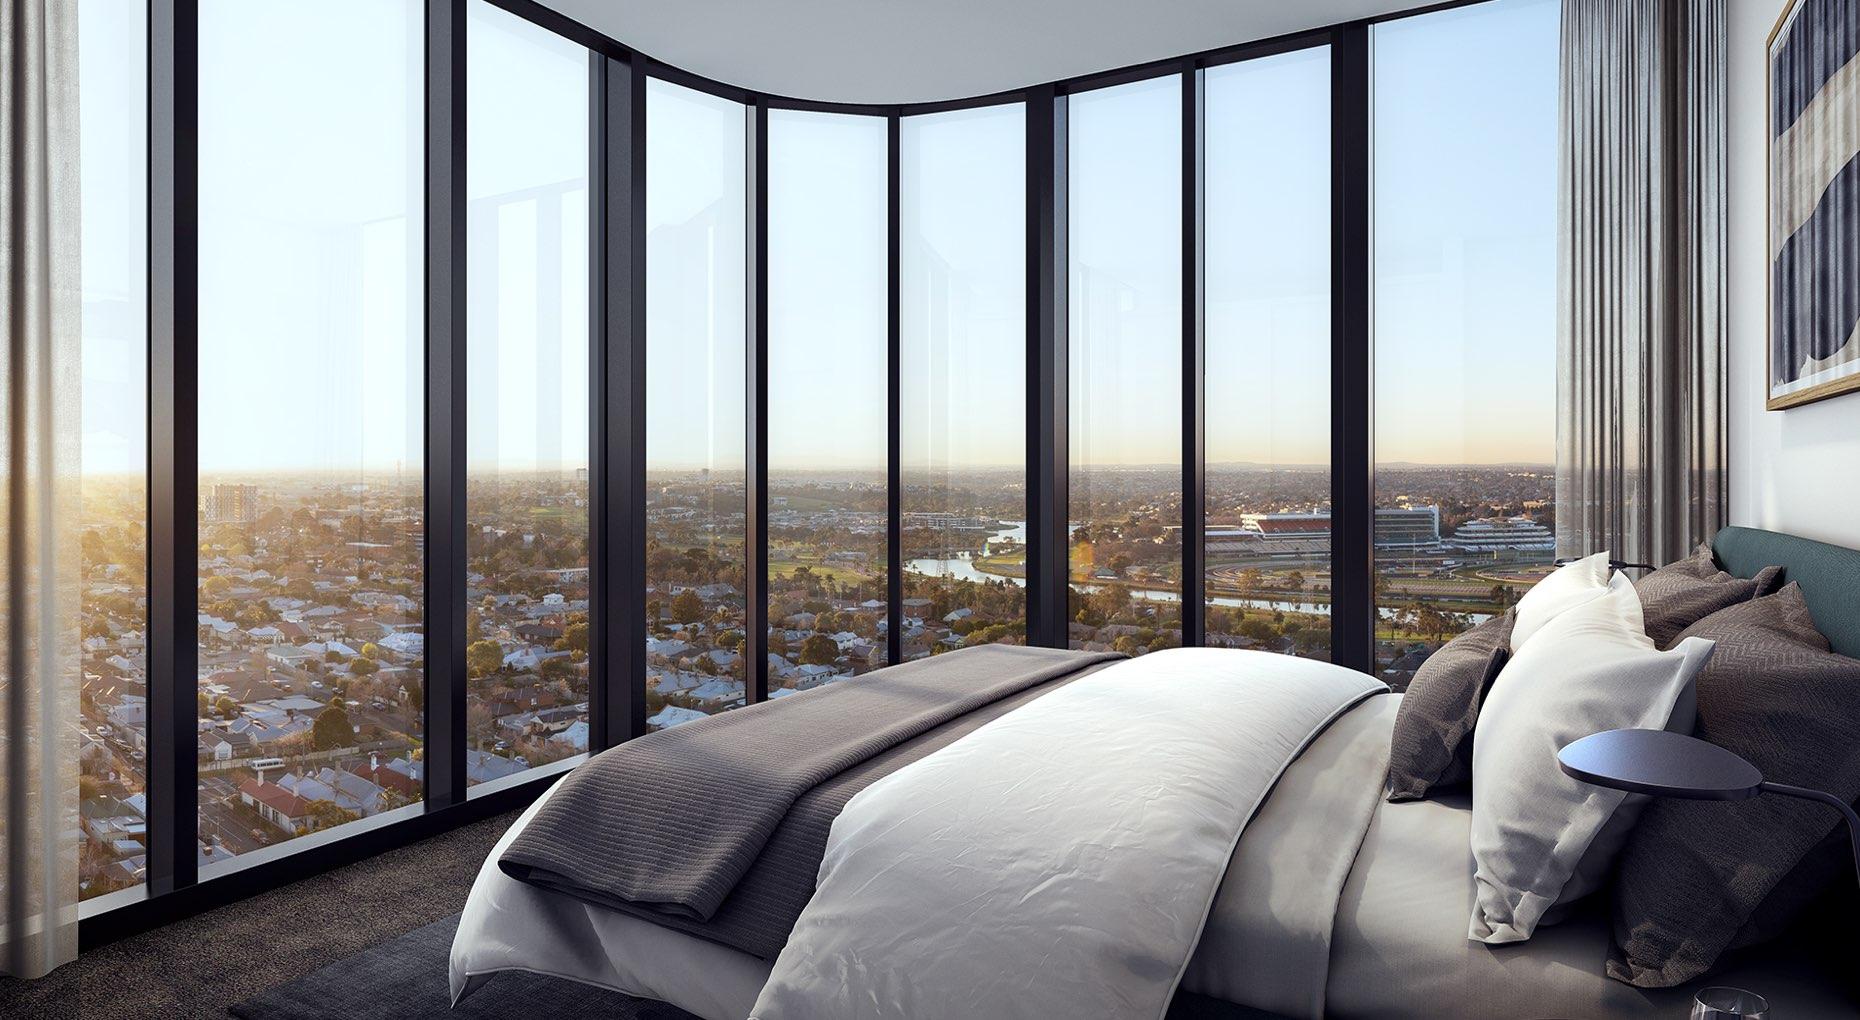 Liberty-One-Render-Footscray-IN06-Type-11-LVL-21-Master-Bedroom